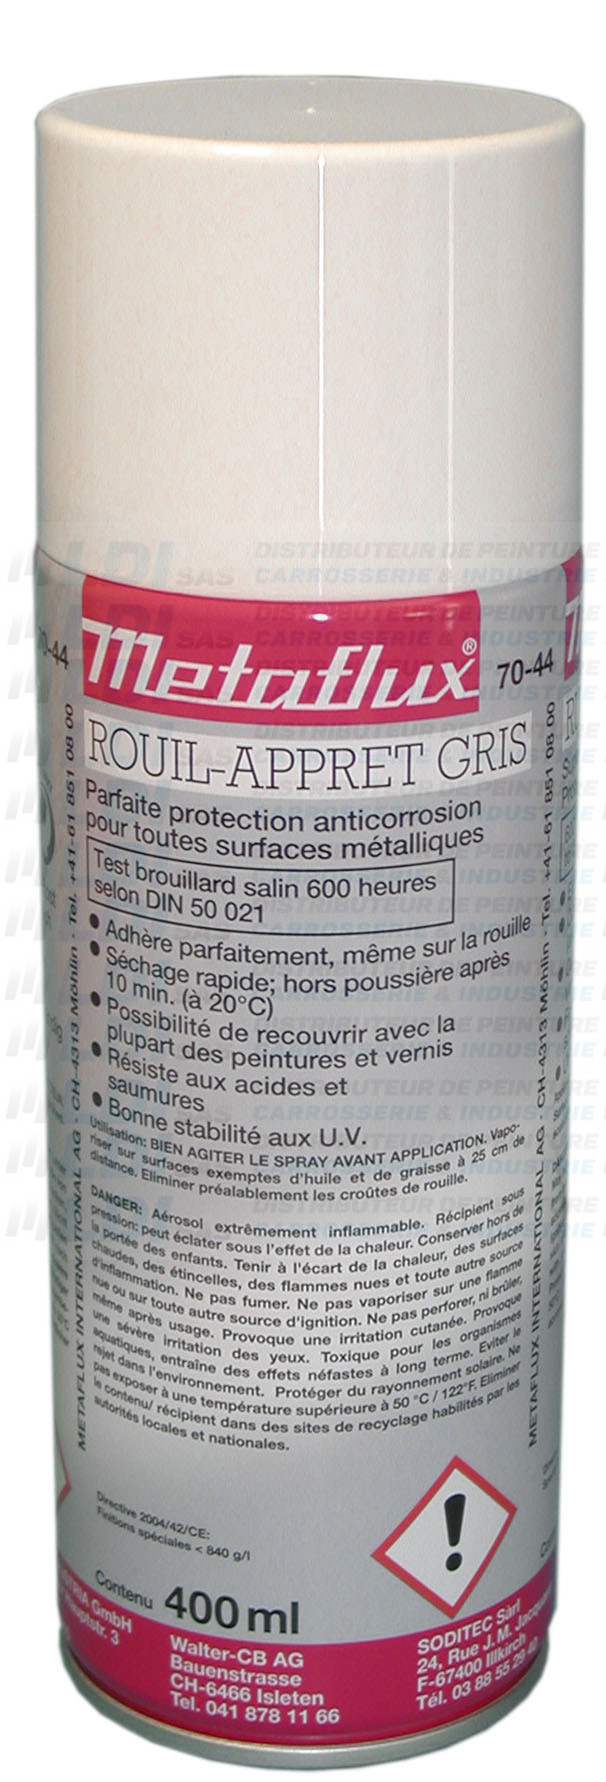 AEROSOL ROUILL' APPRET GRIS 400ML